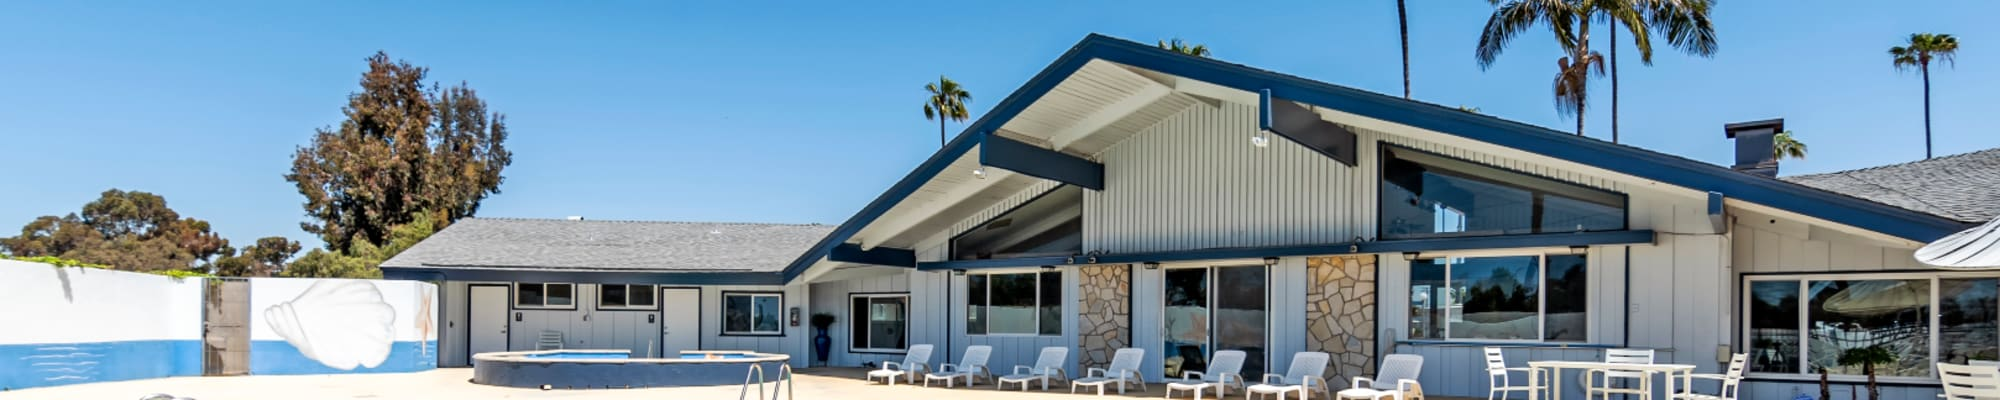 Schedule a tour at Brentwood in Chula Vista, California